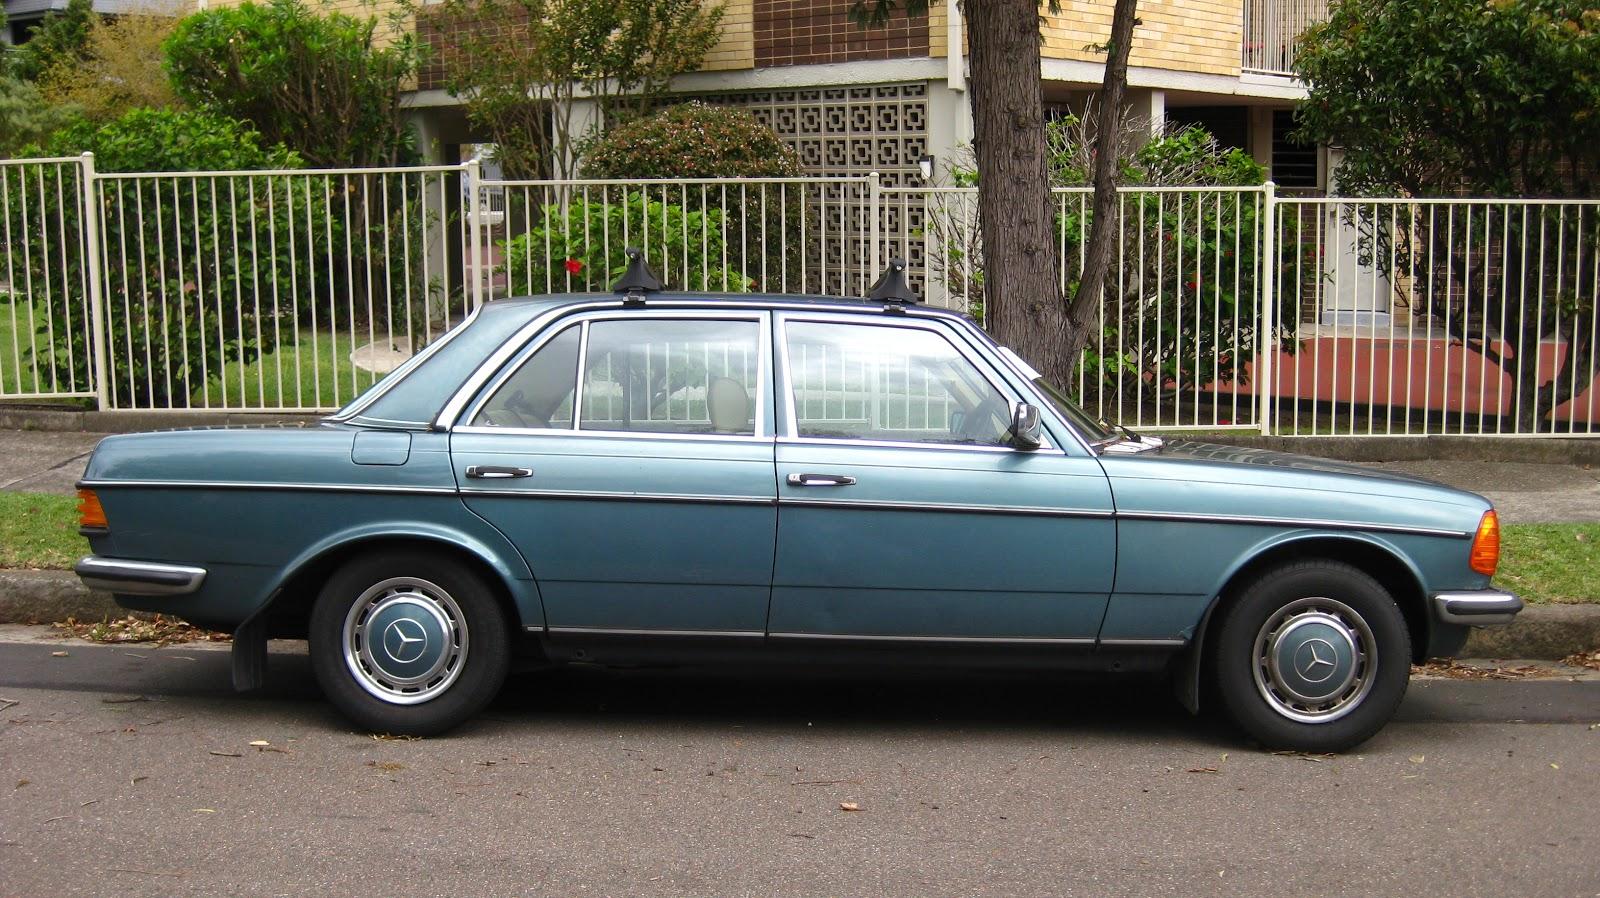 Aussie Old Parked Cars 1980 Mercedes Benz W123 280 E